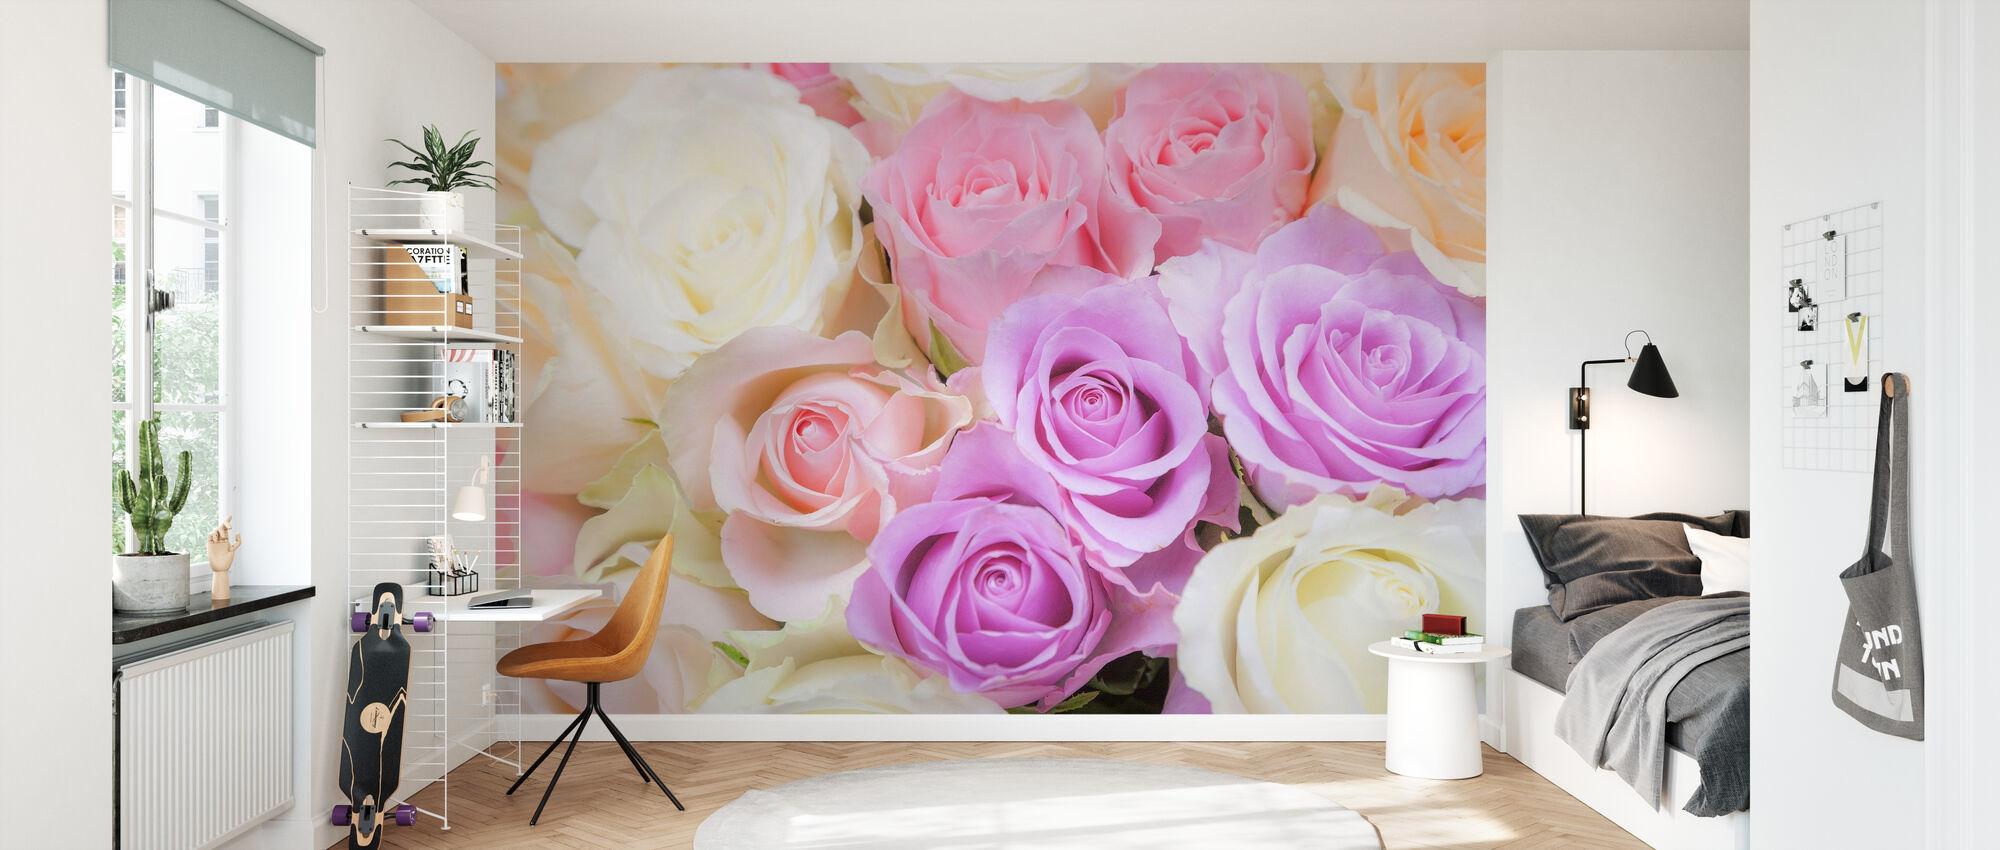 Colorful Roses - Wallpaper - Kids Room